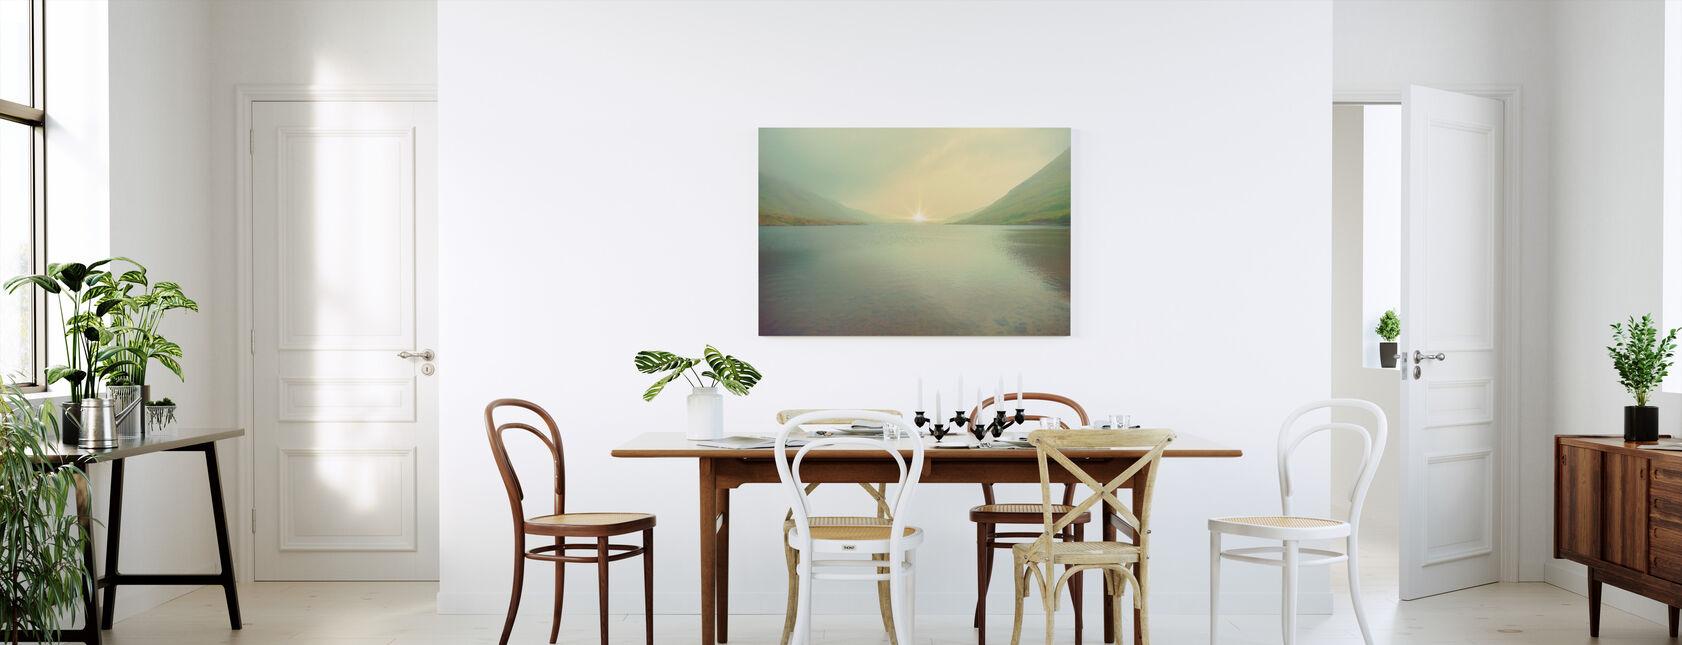 Iriscent Sunrise - Canvastaulu - Keittiö